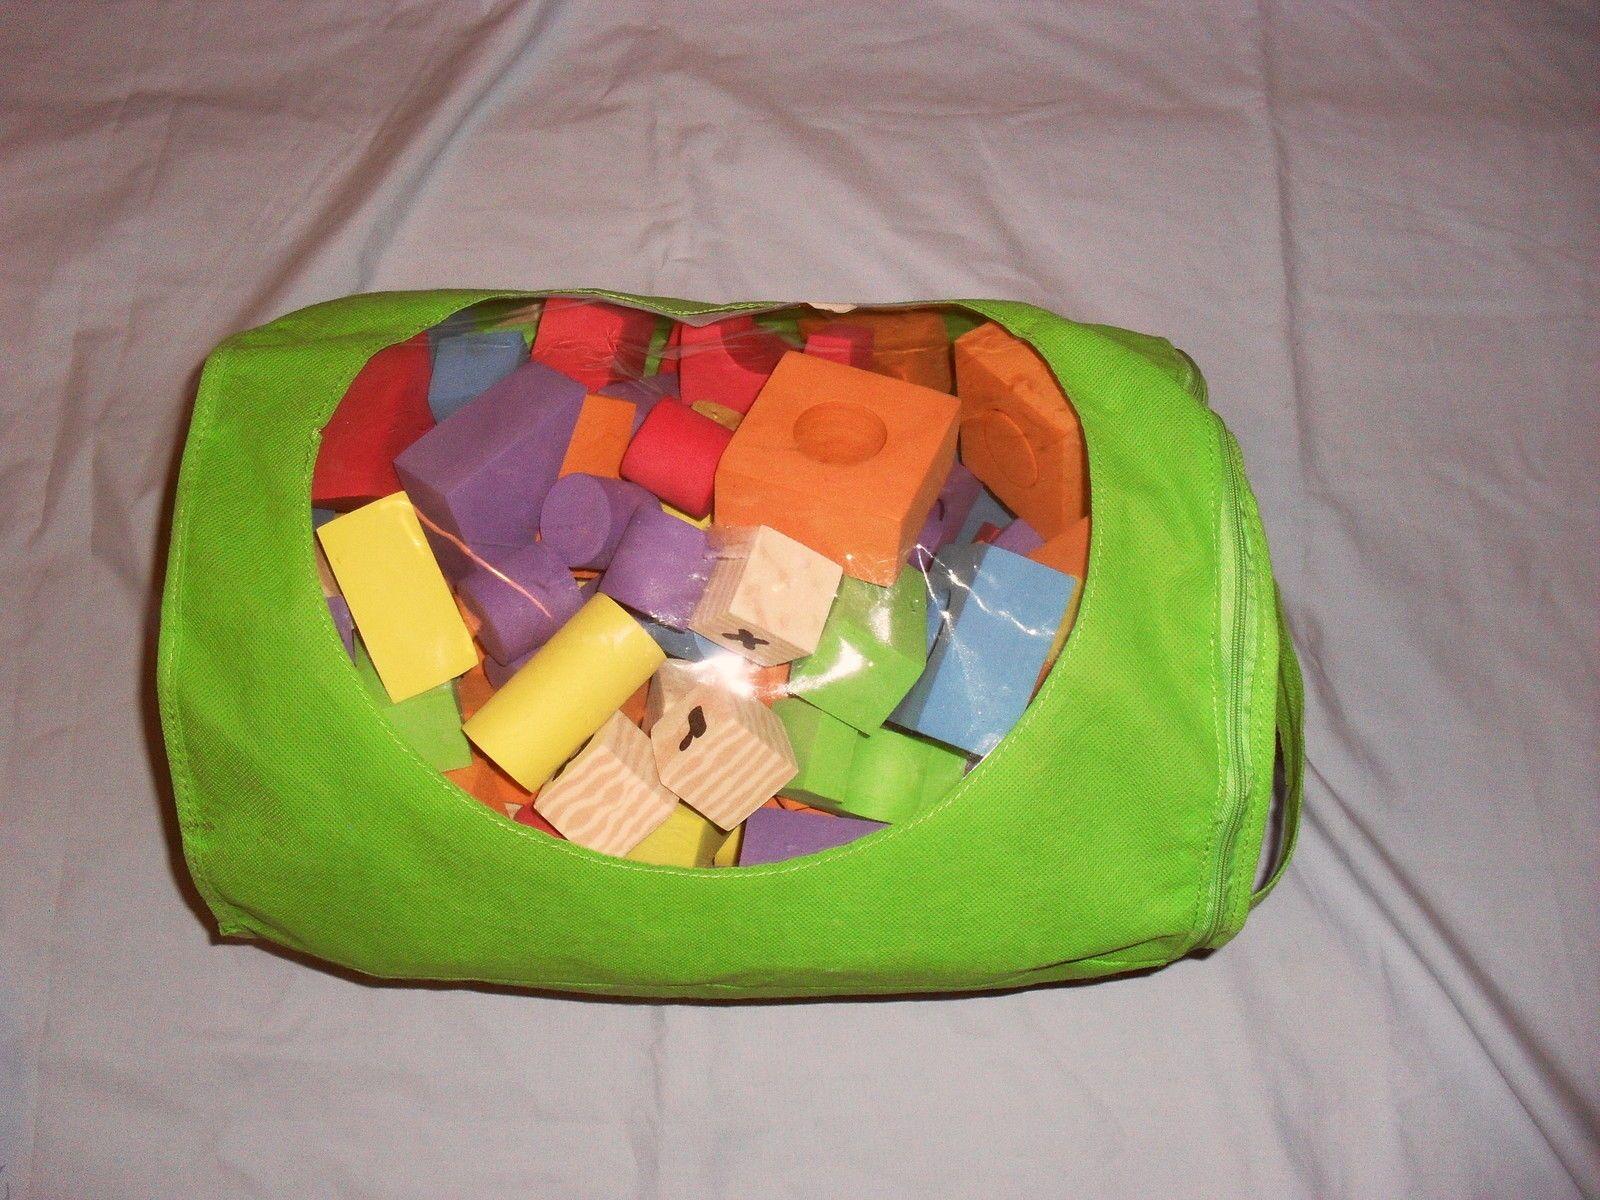 Foam Building Blocks In Bag With